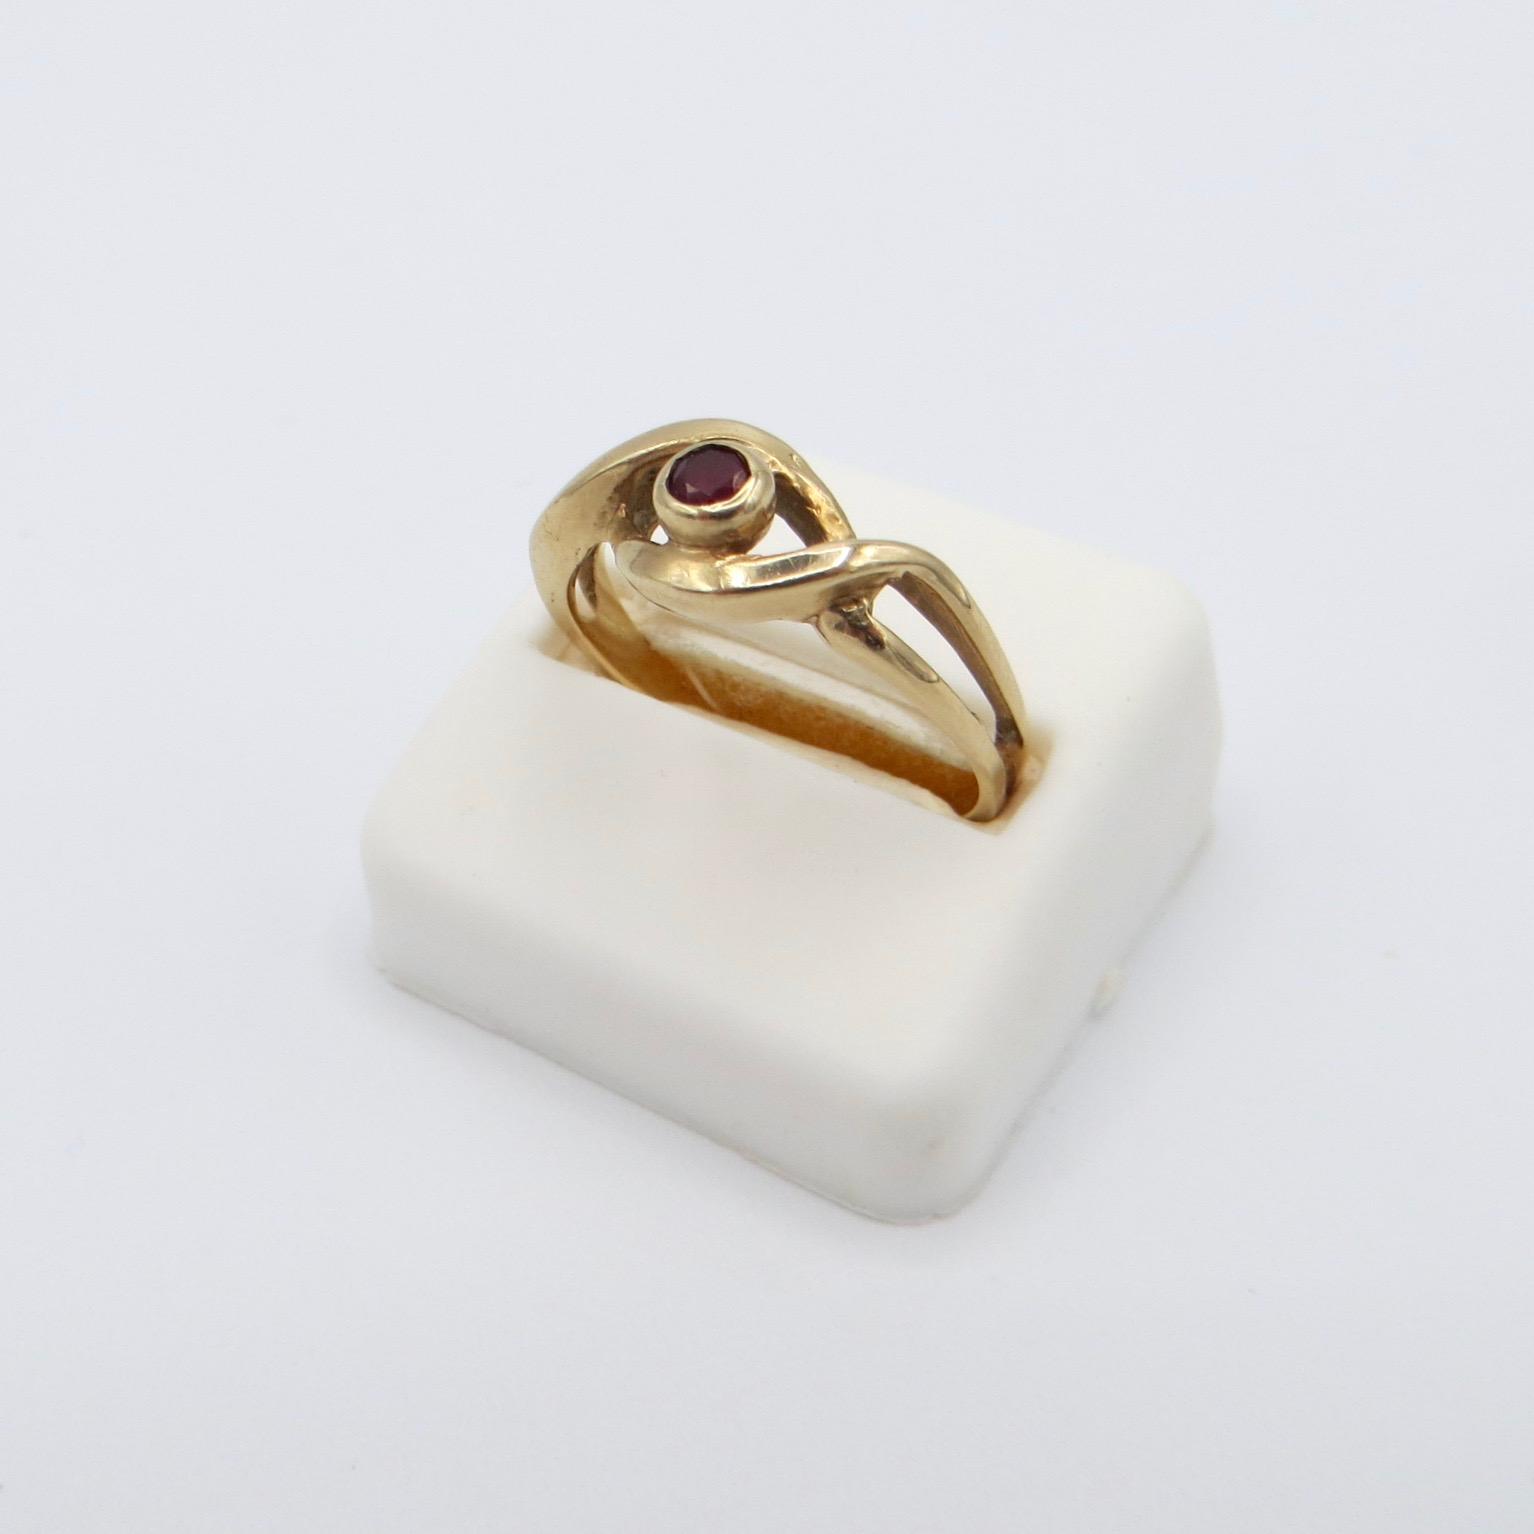 10kt Gold & Garnet Ring